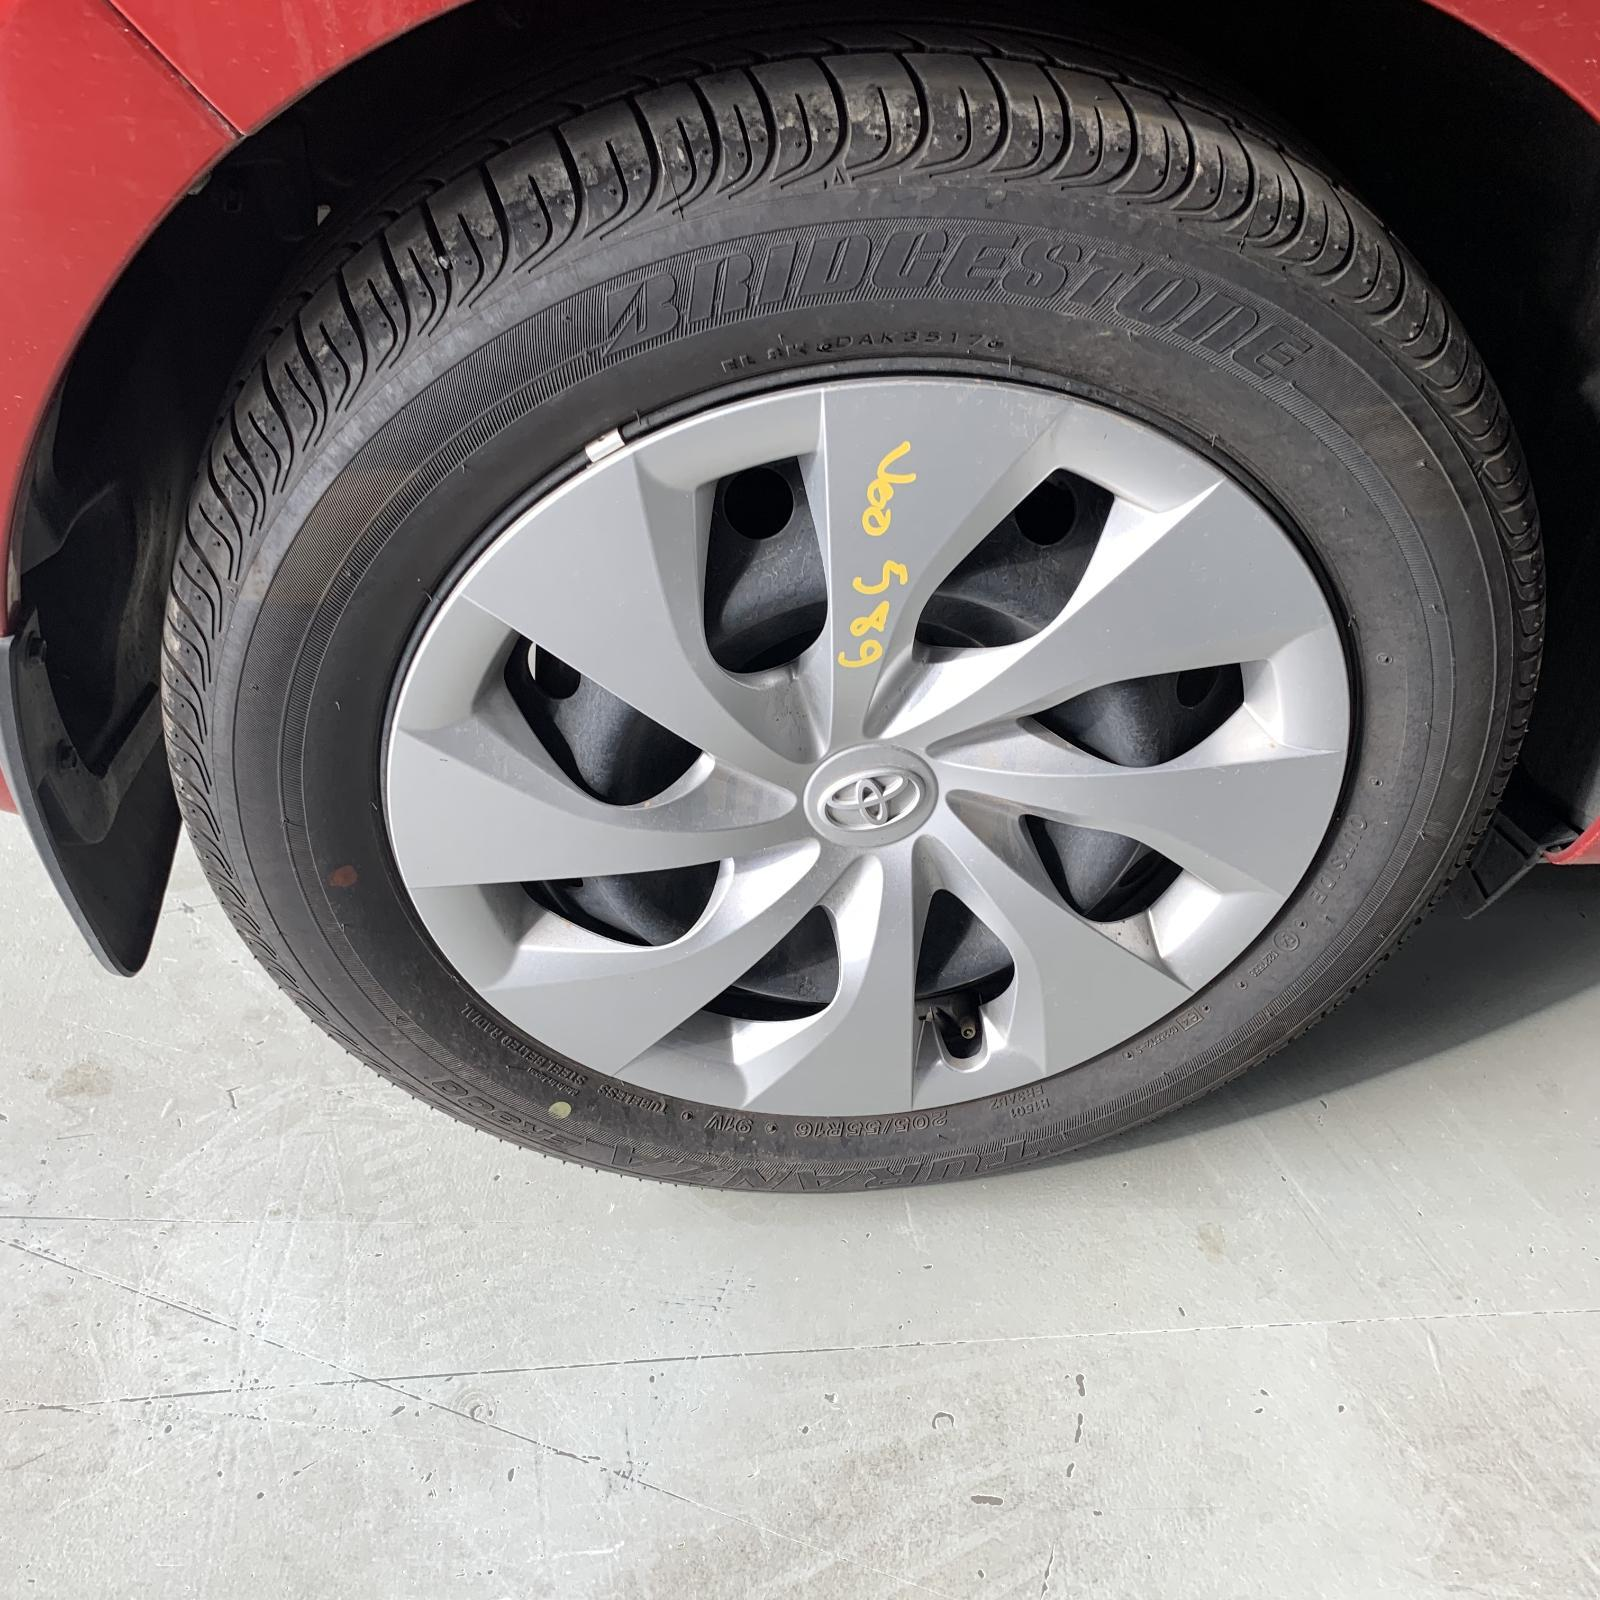 TOYOTA COROLLA, Wheel Cover/Hub Cap, ZRE182R 10/12-06/18